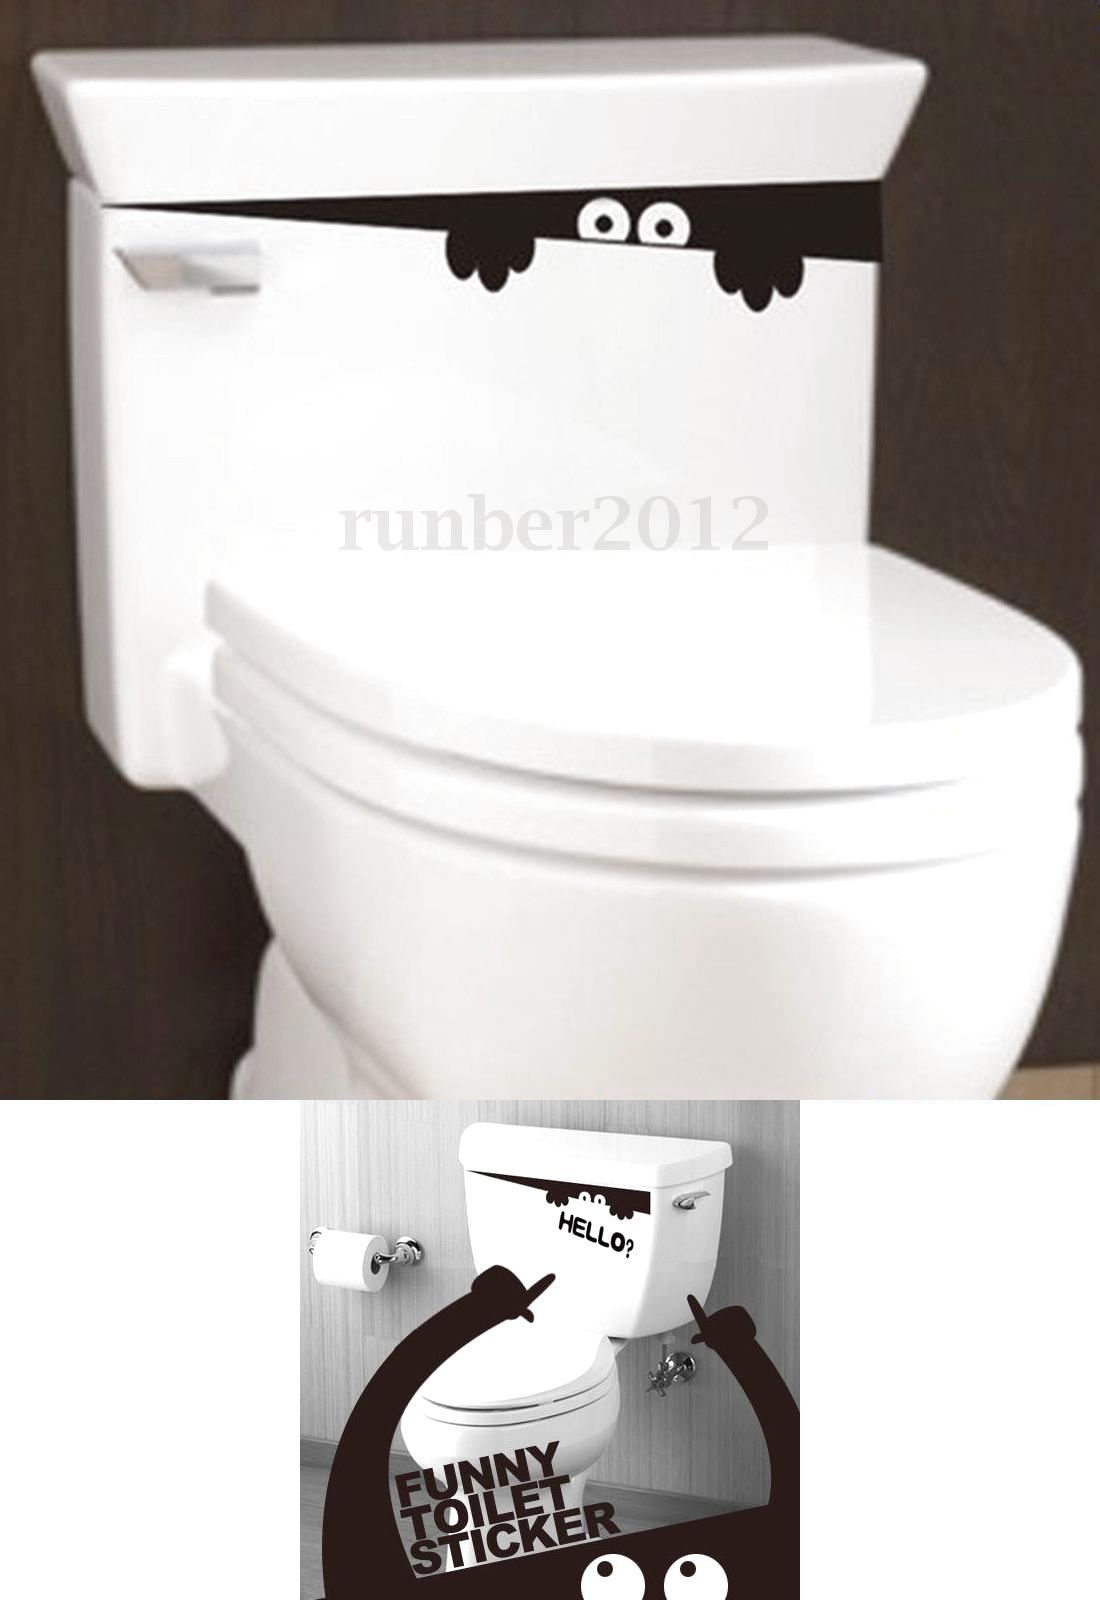 Funny bathroom toilet sticker monster decor hello removable wall art